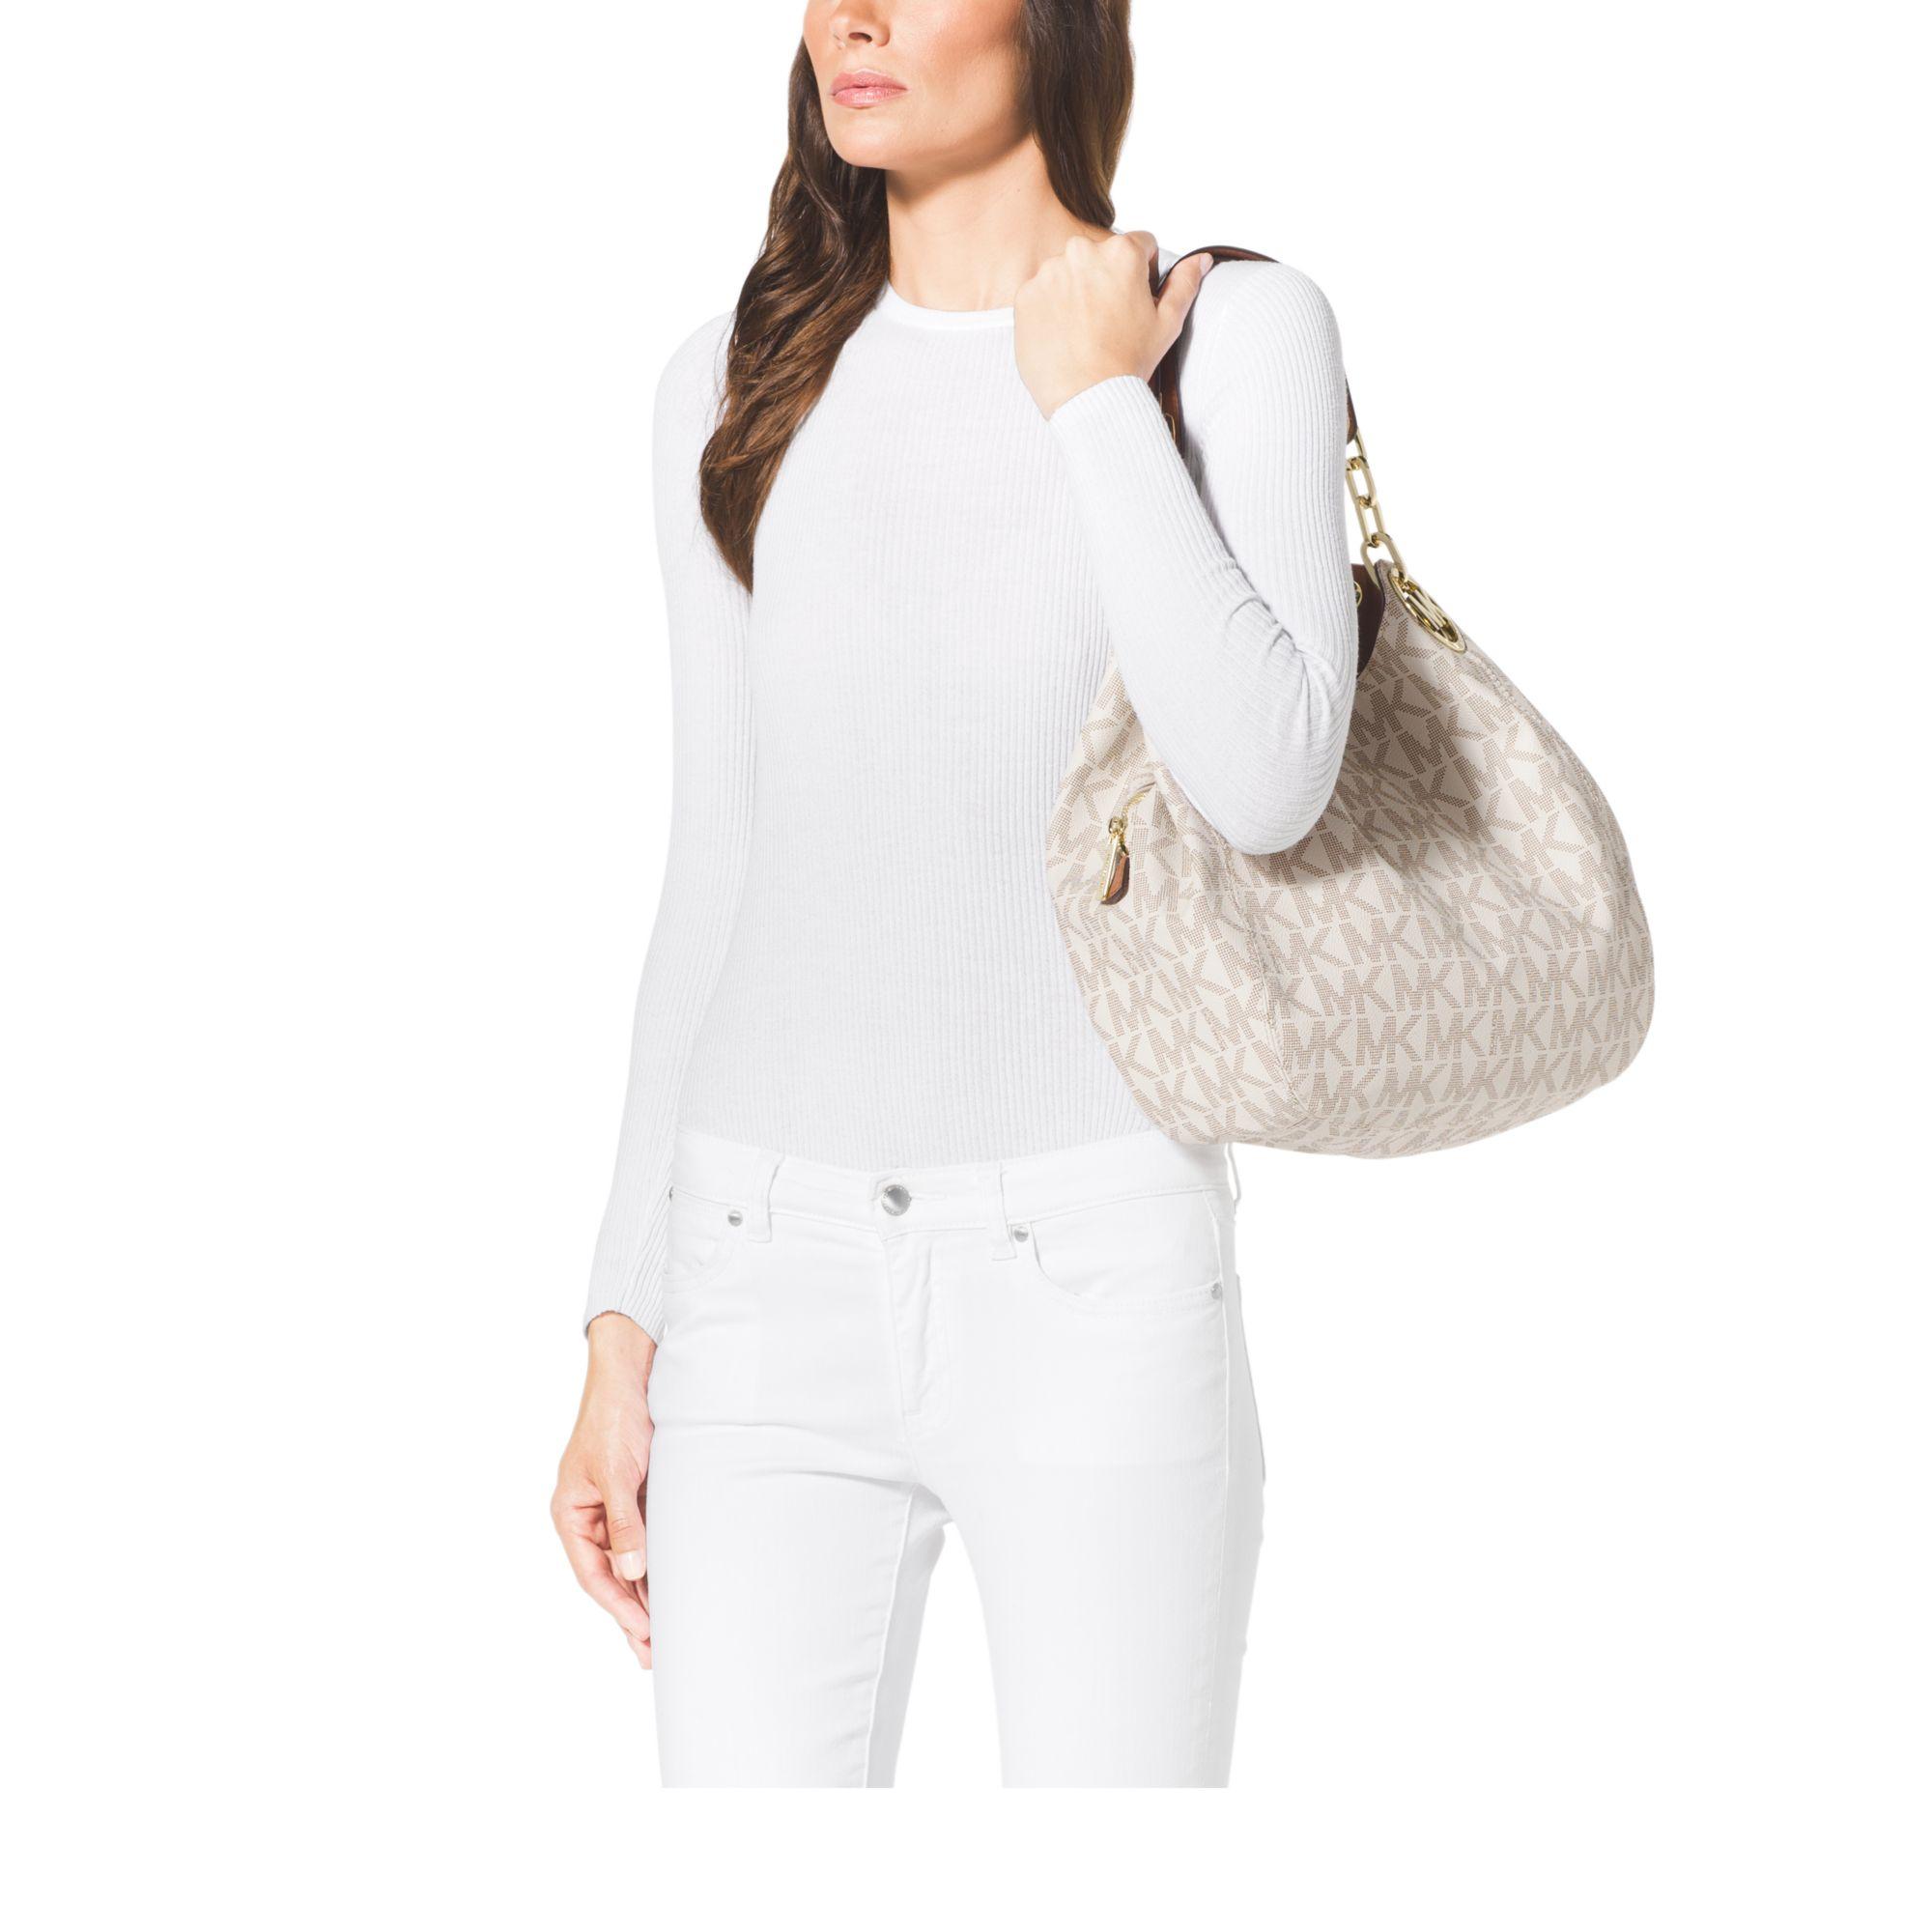 b2a8f252cf45c8 Michael Kors Fulton Large Logo Shoulder Bag in White - Lyst